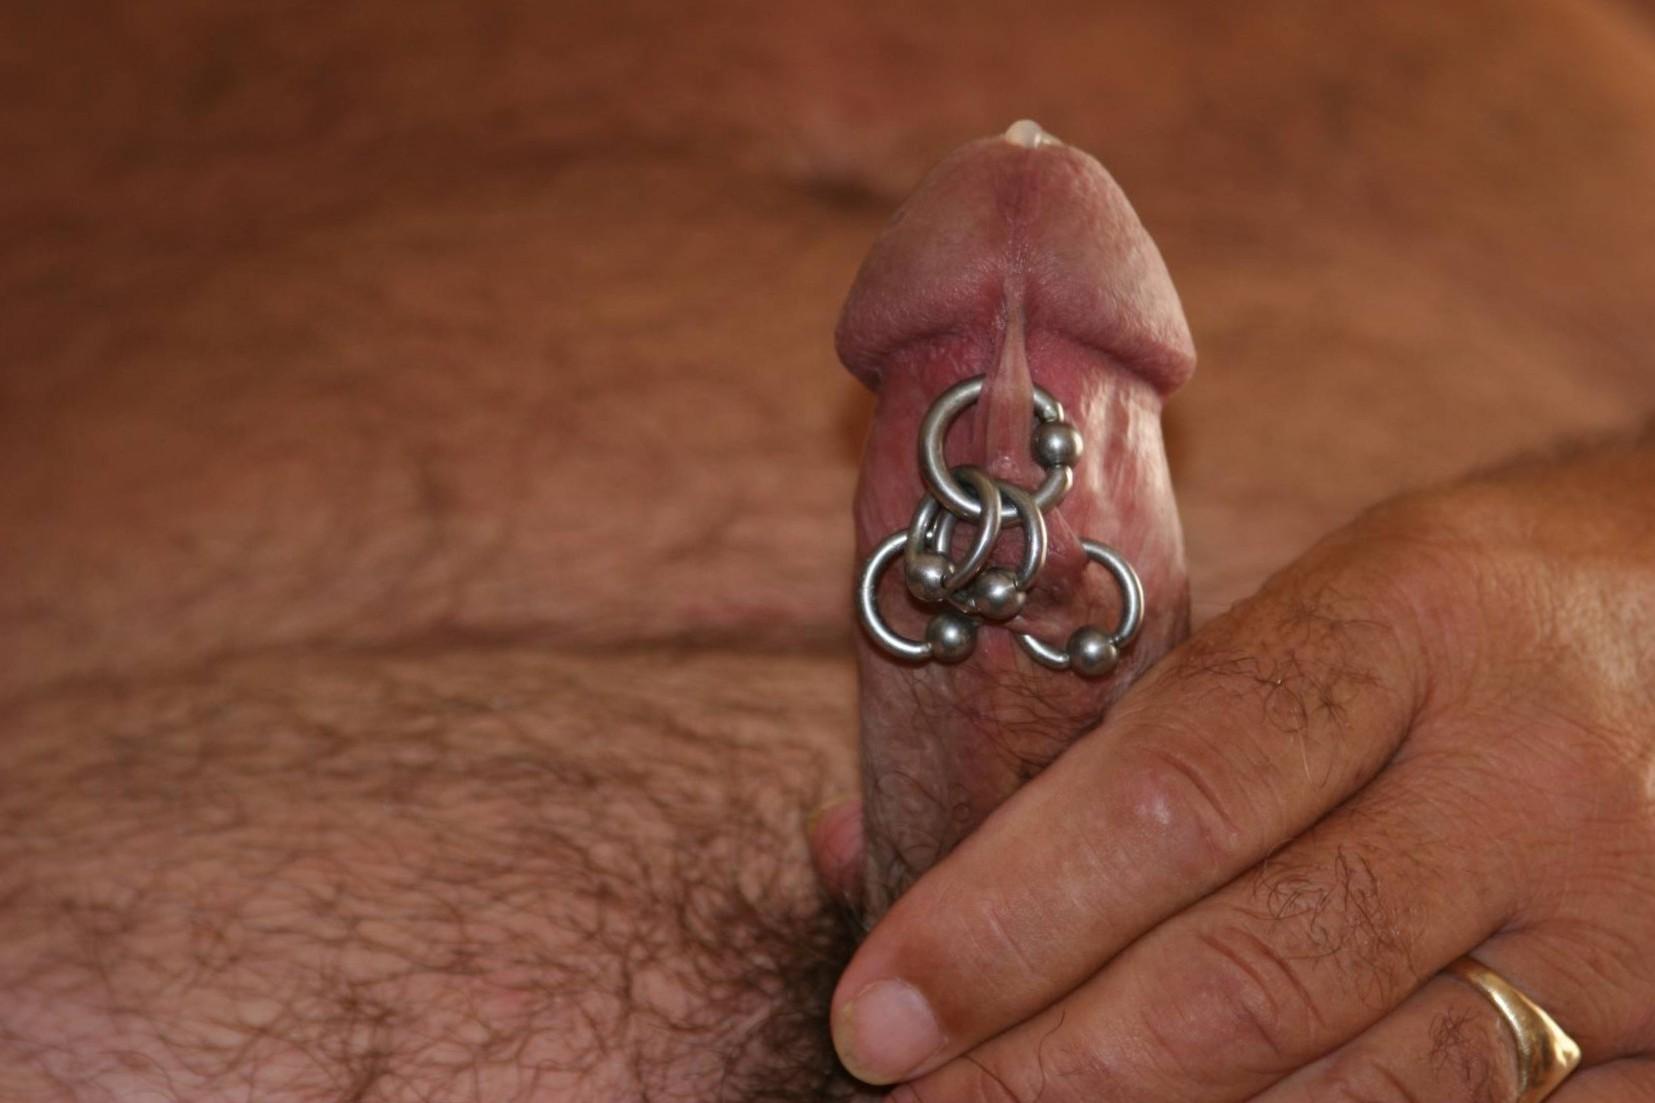 precum and piercings